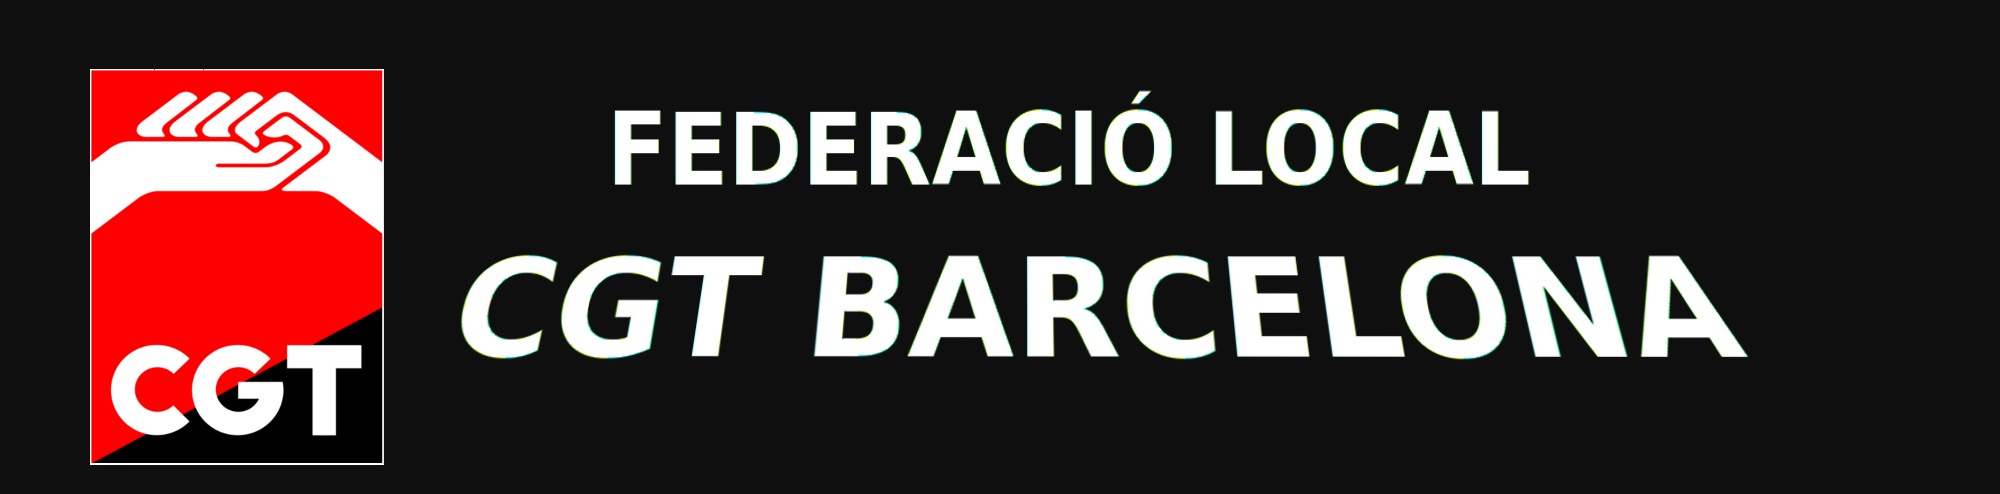 CGT Barcelona